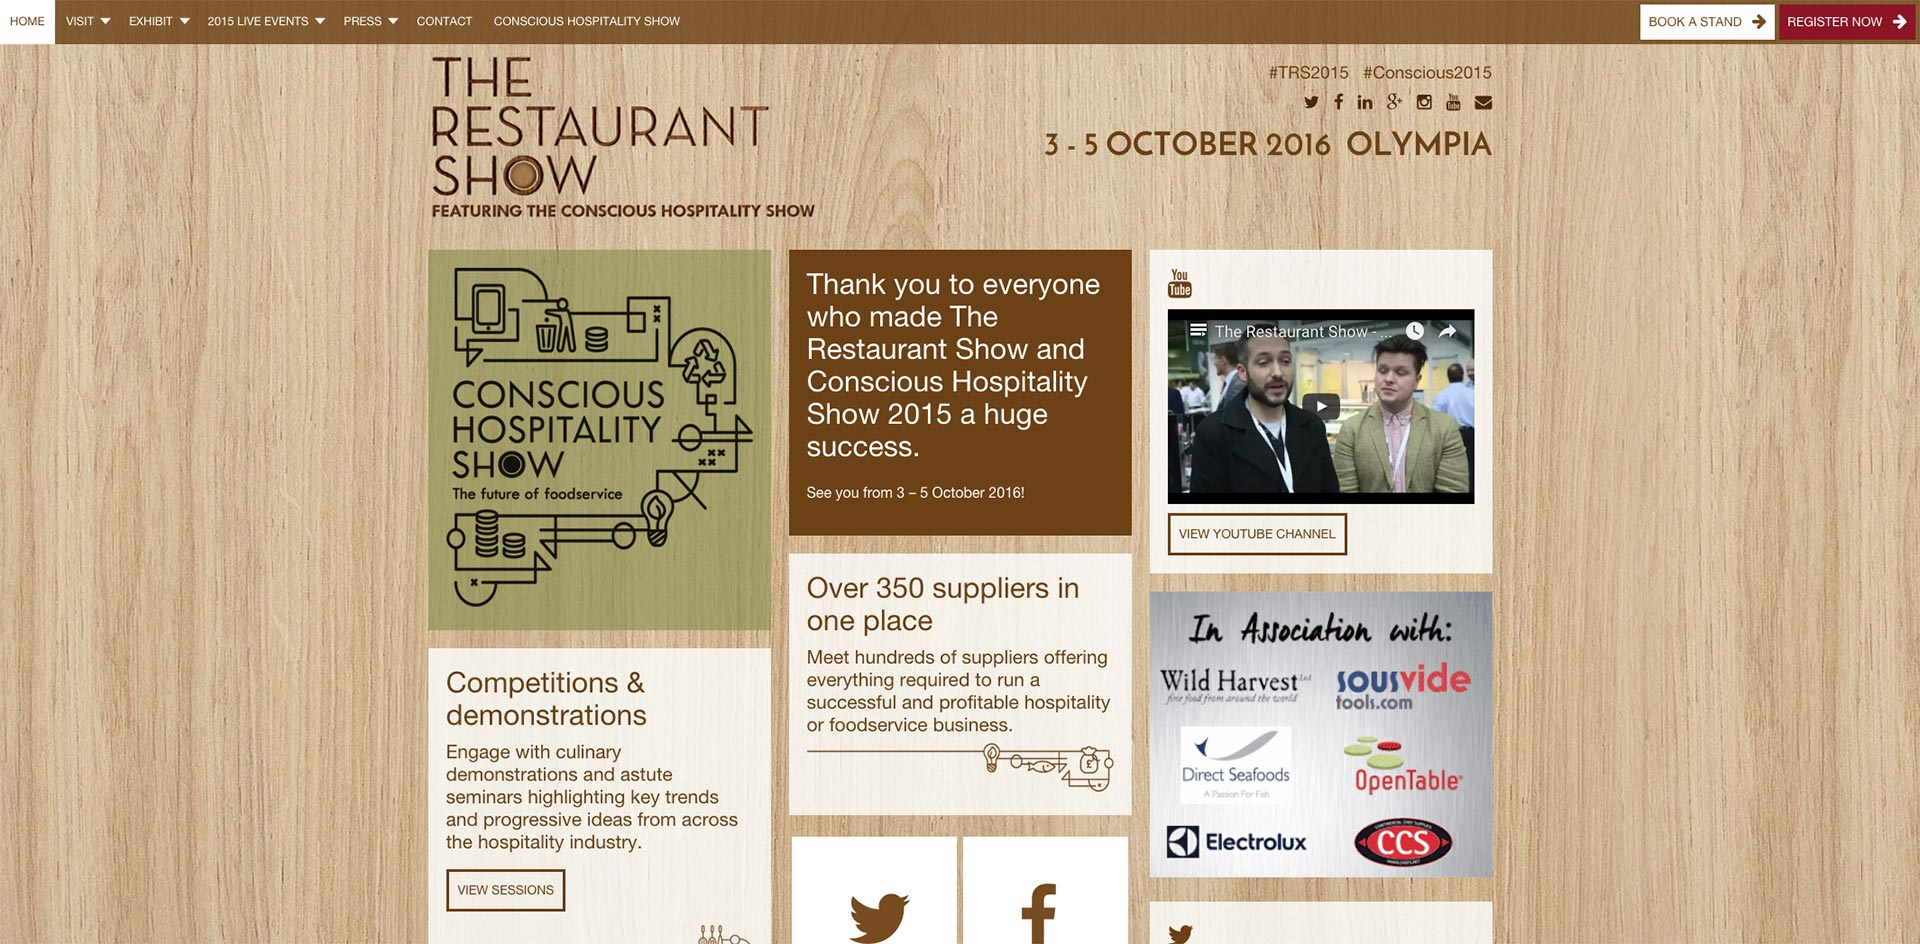 The Restaurant Show 2015